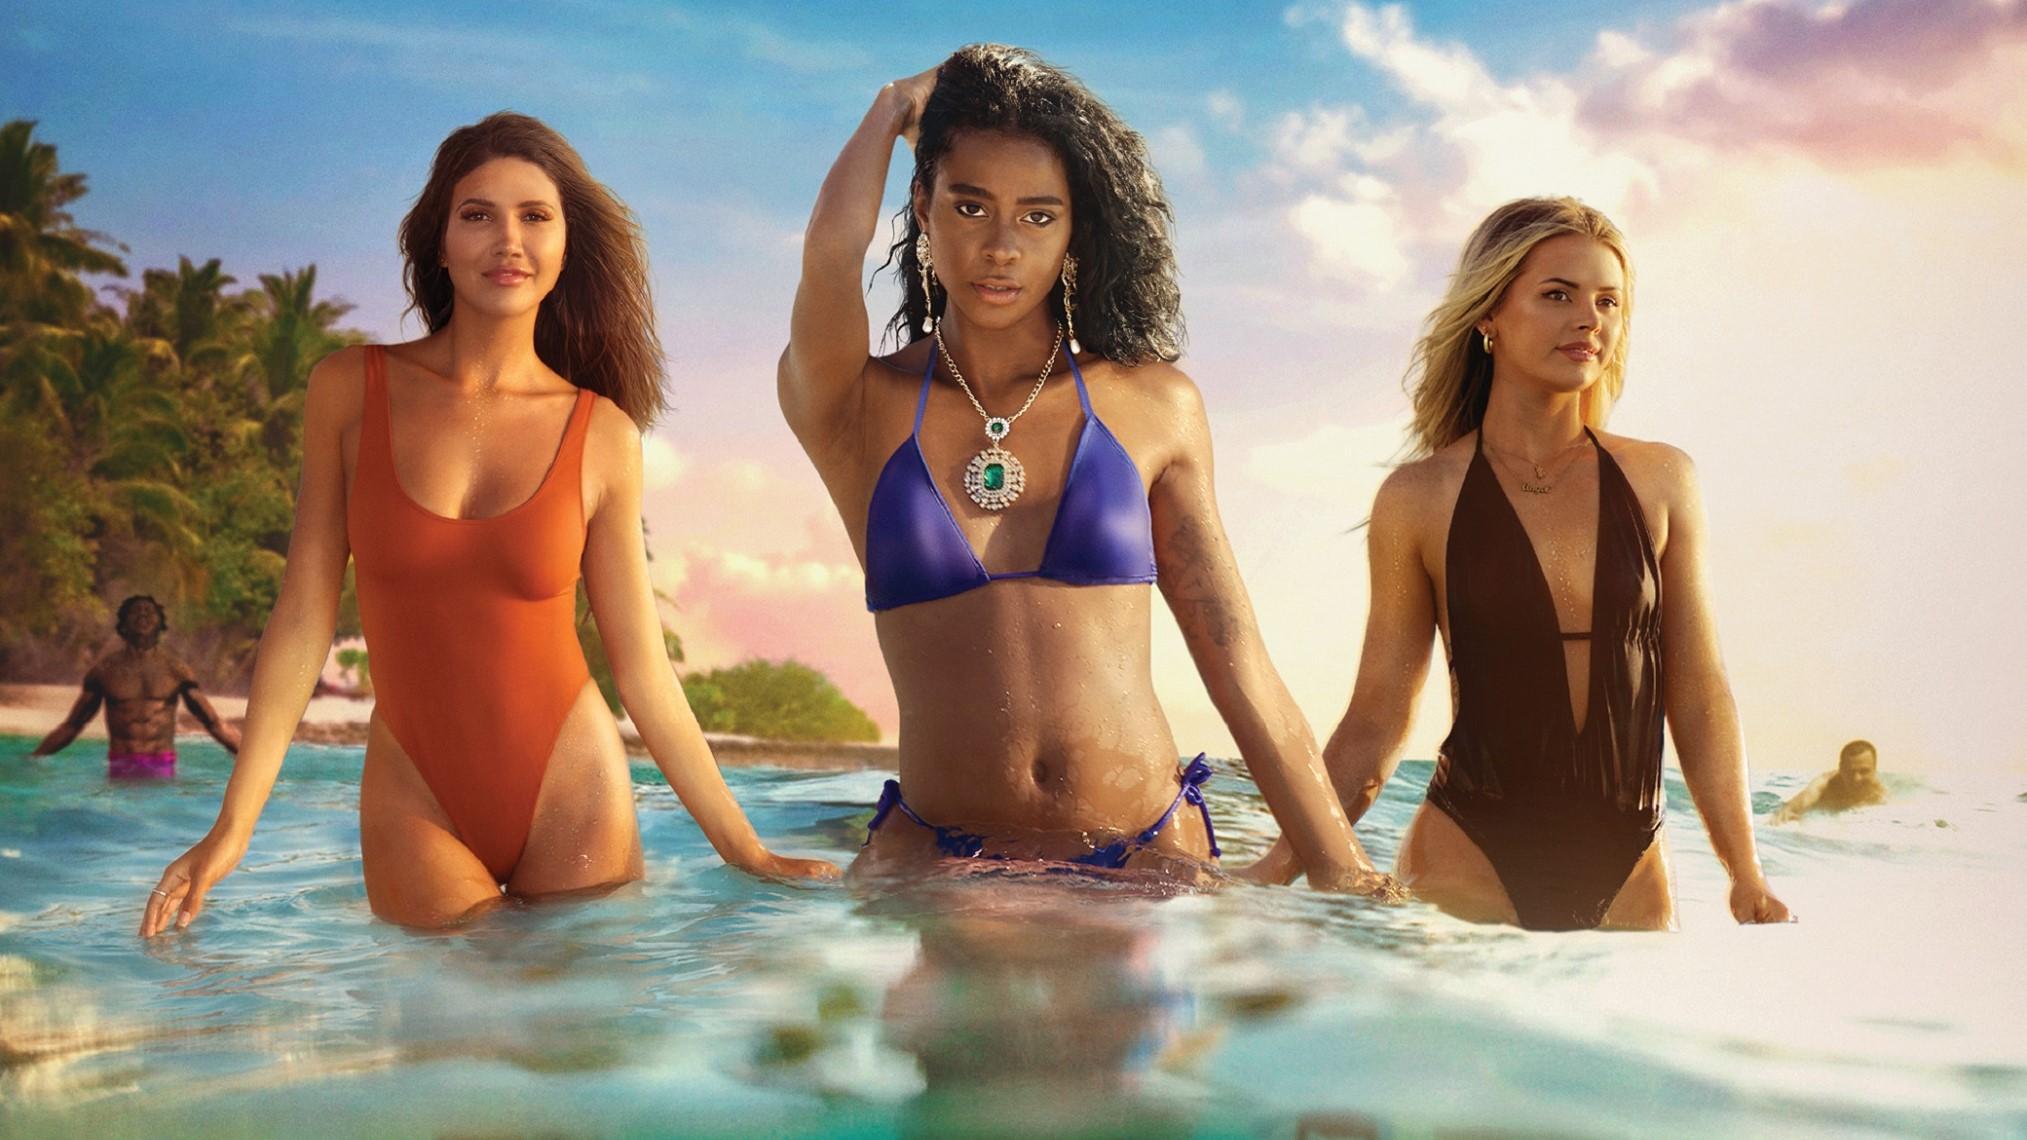 FBoy Island Season 1 on HBO Max